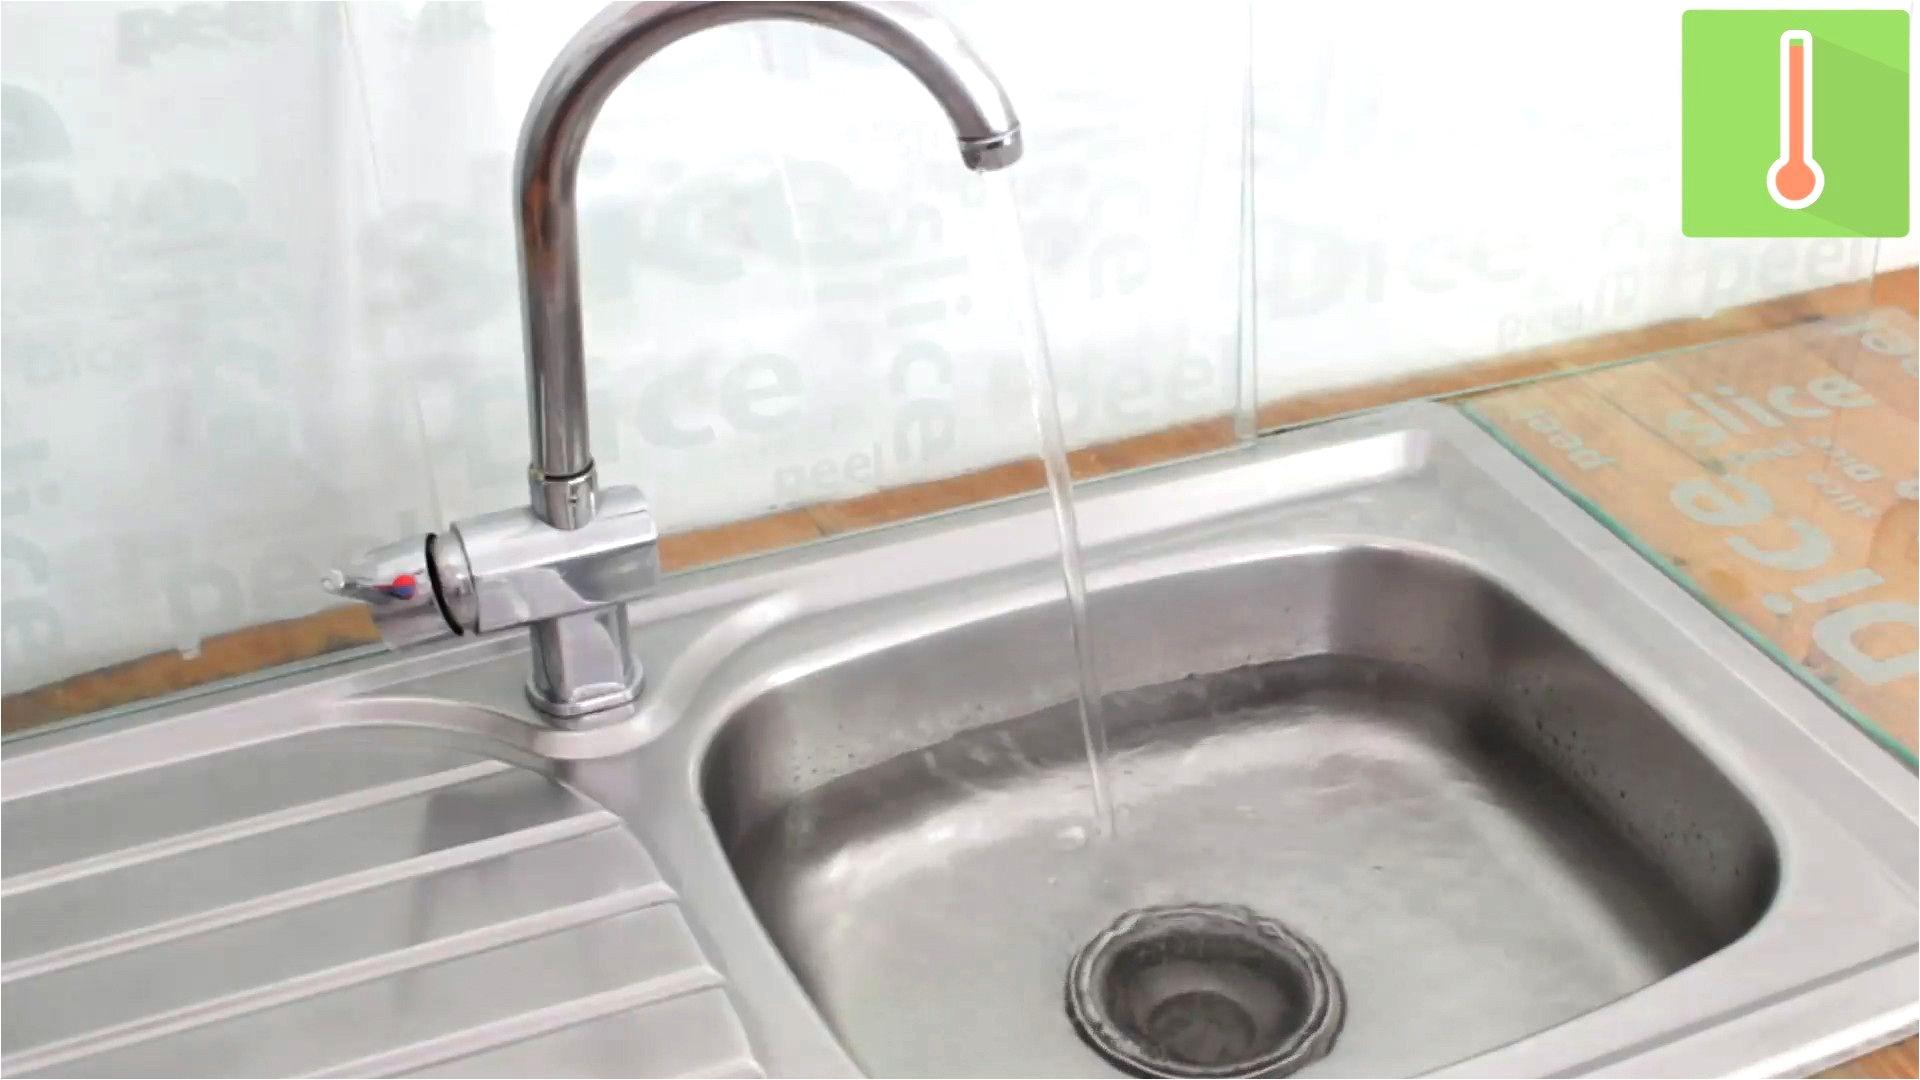 basement floor drain clogged best of tile shower drain fresh bathtub shower drain is constantly clogging